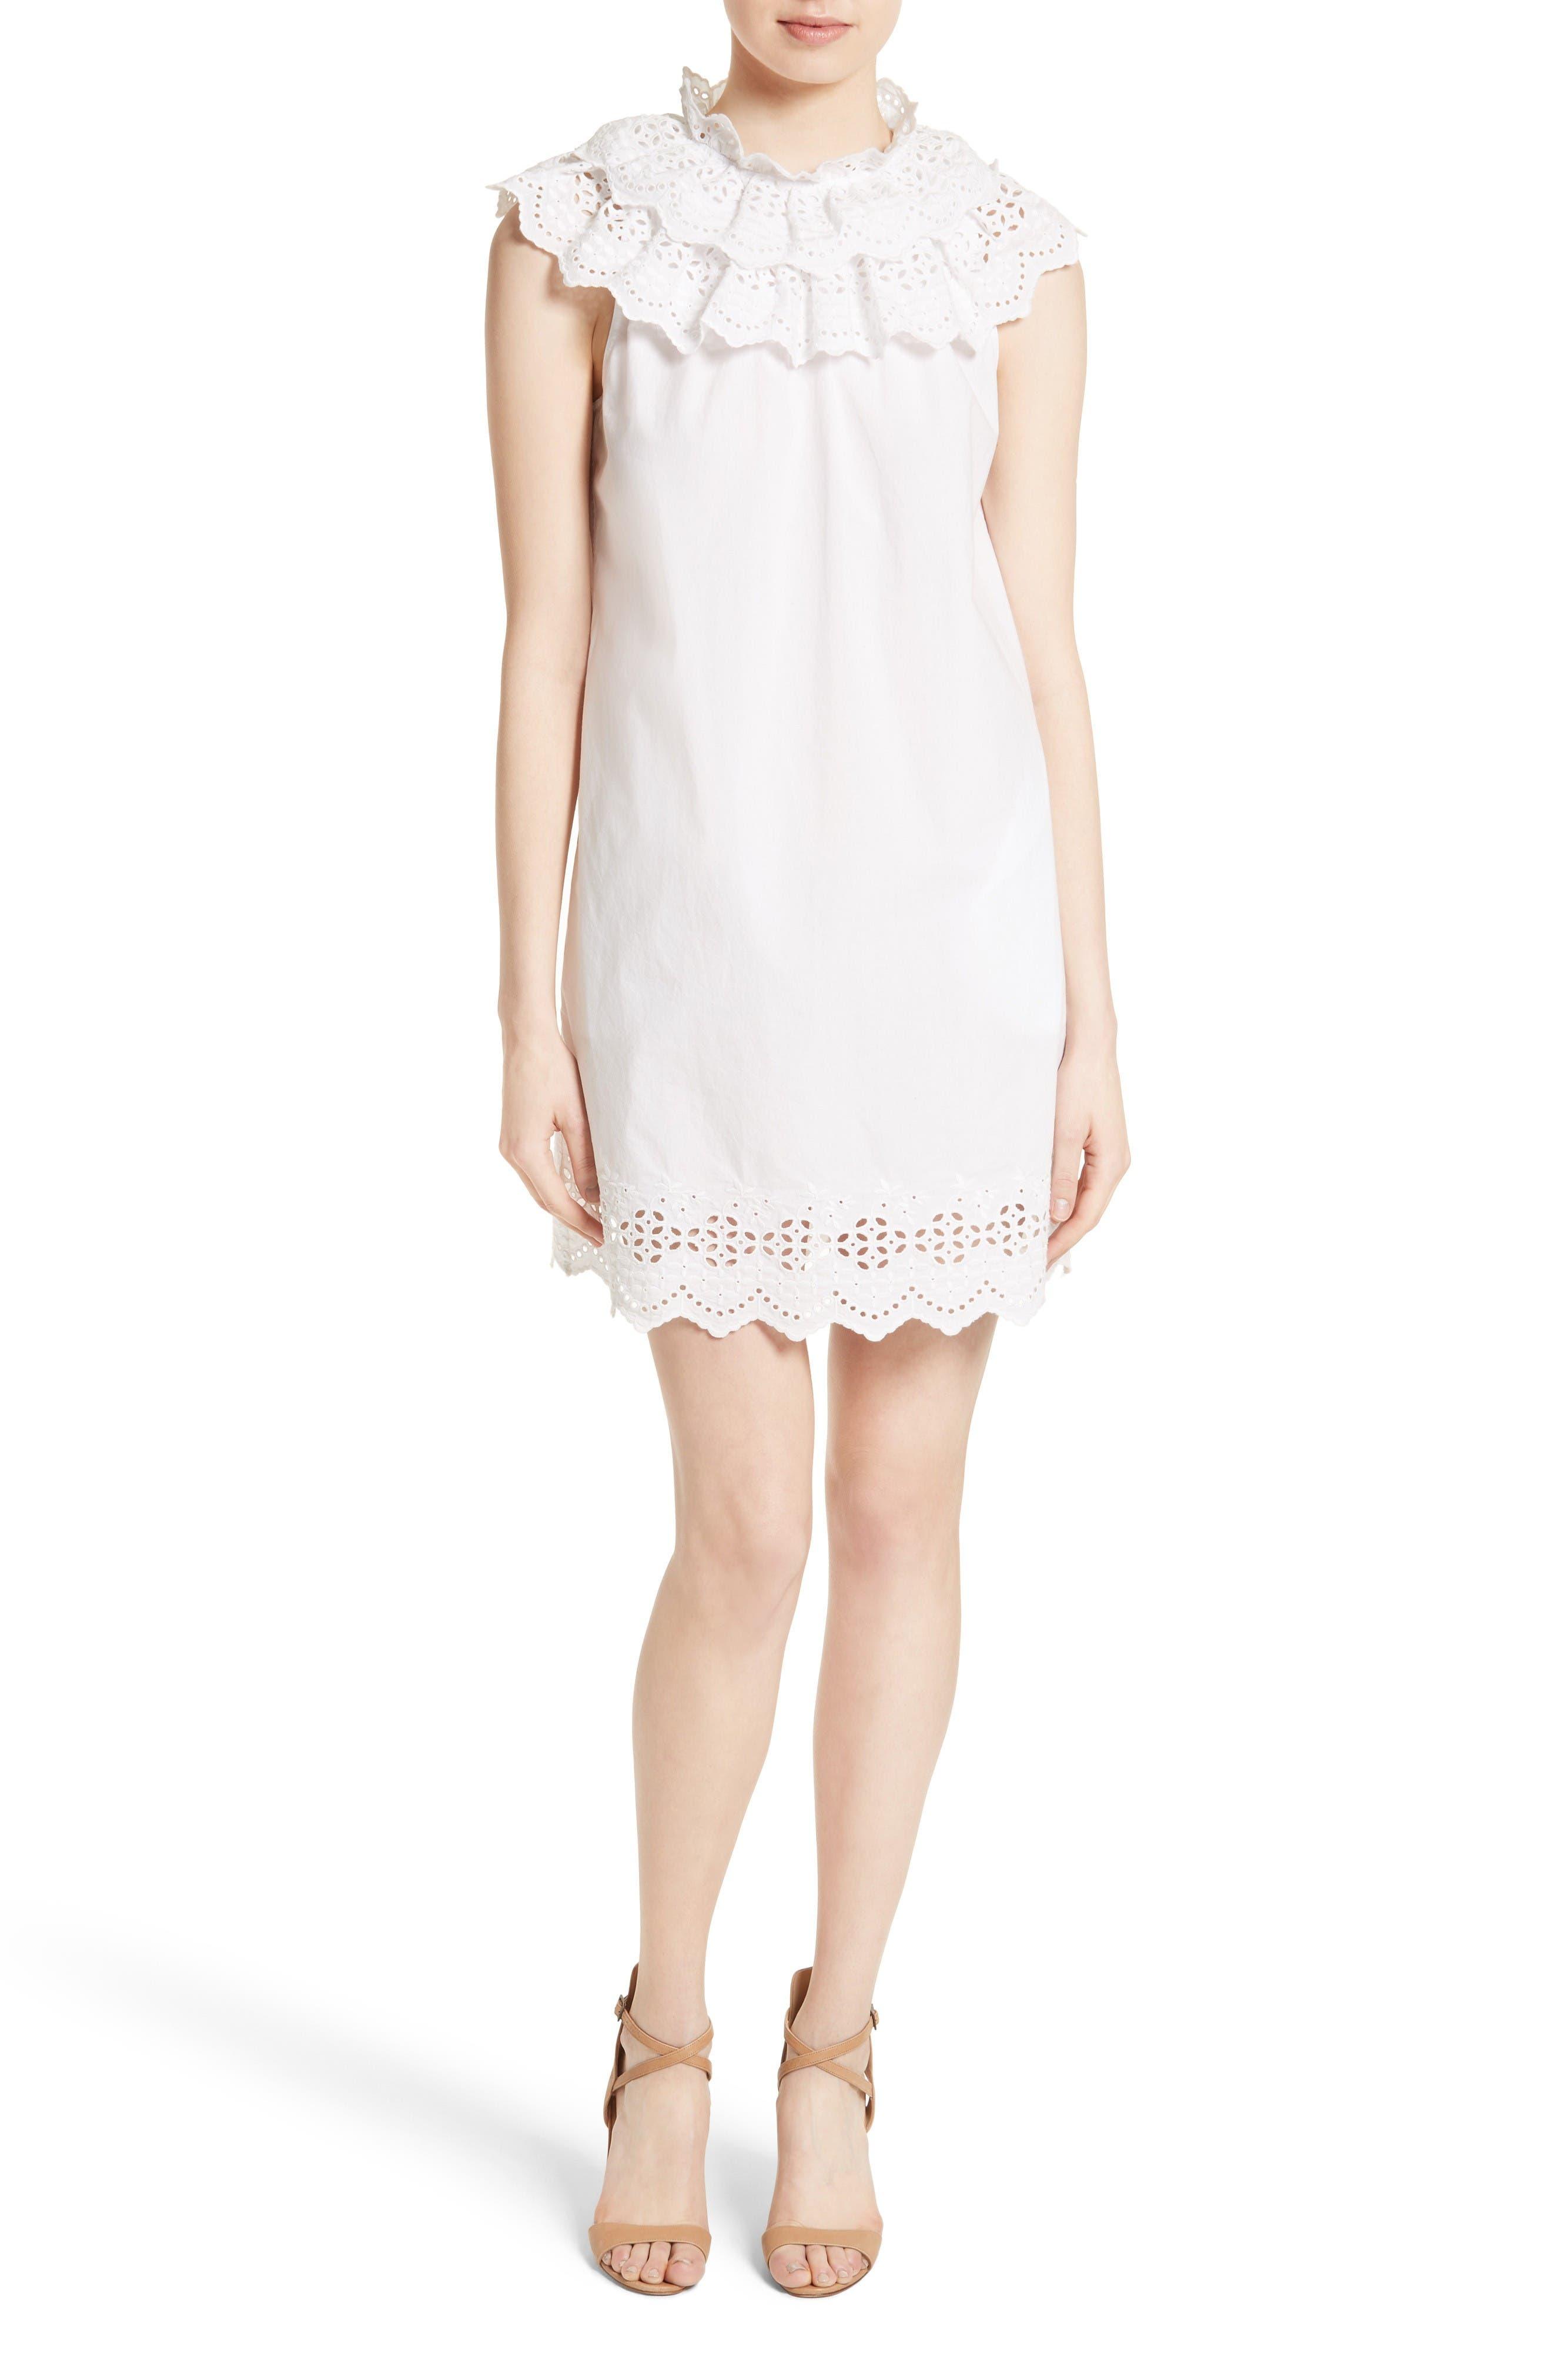 La Vie Rebecca Taylor Eyelet Shift Dress